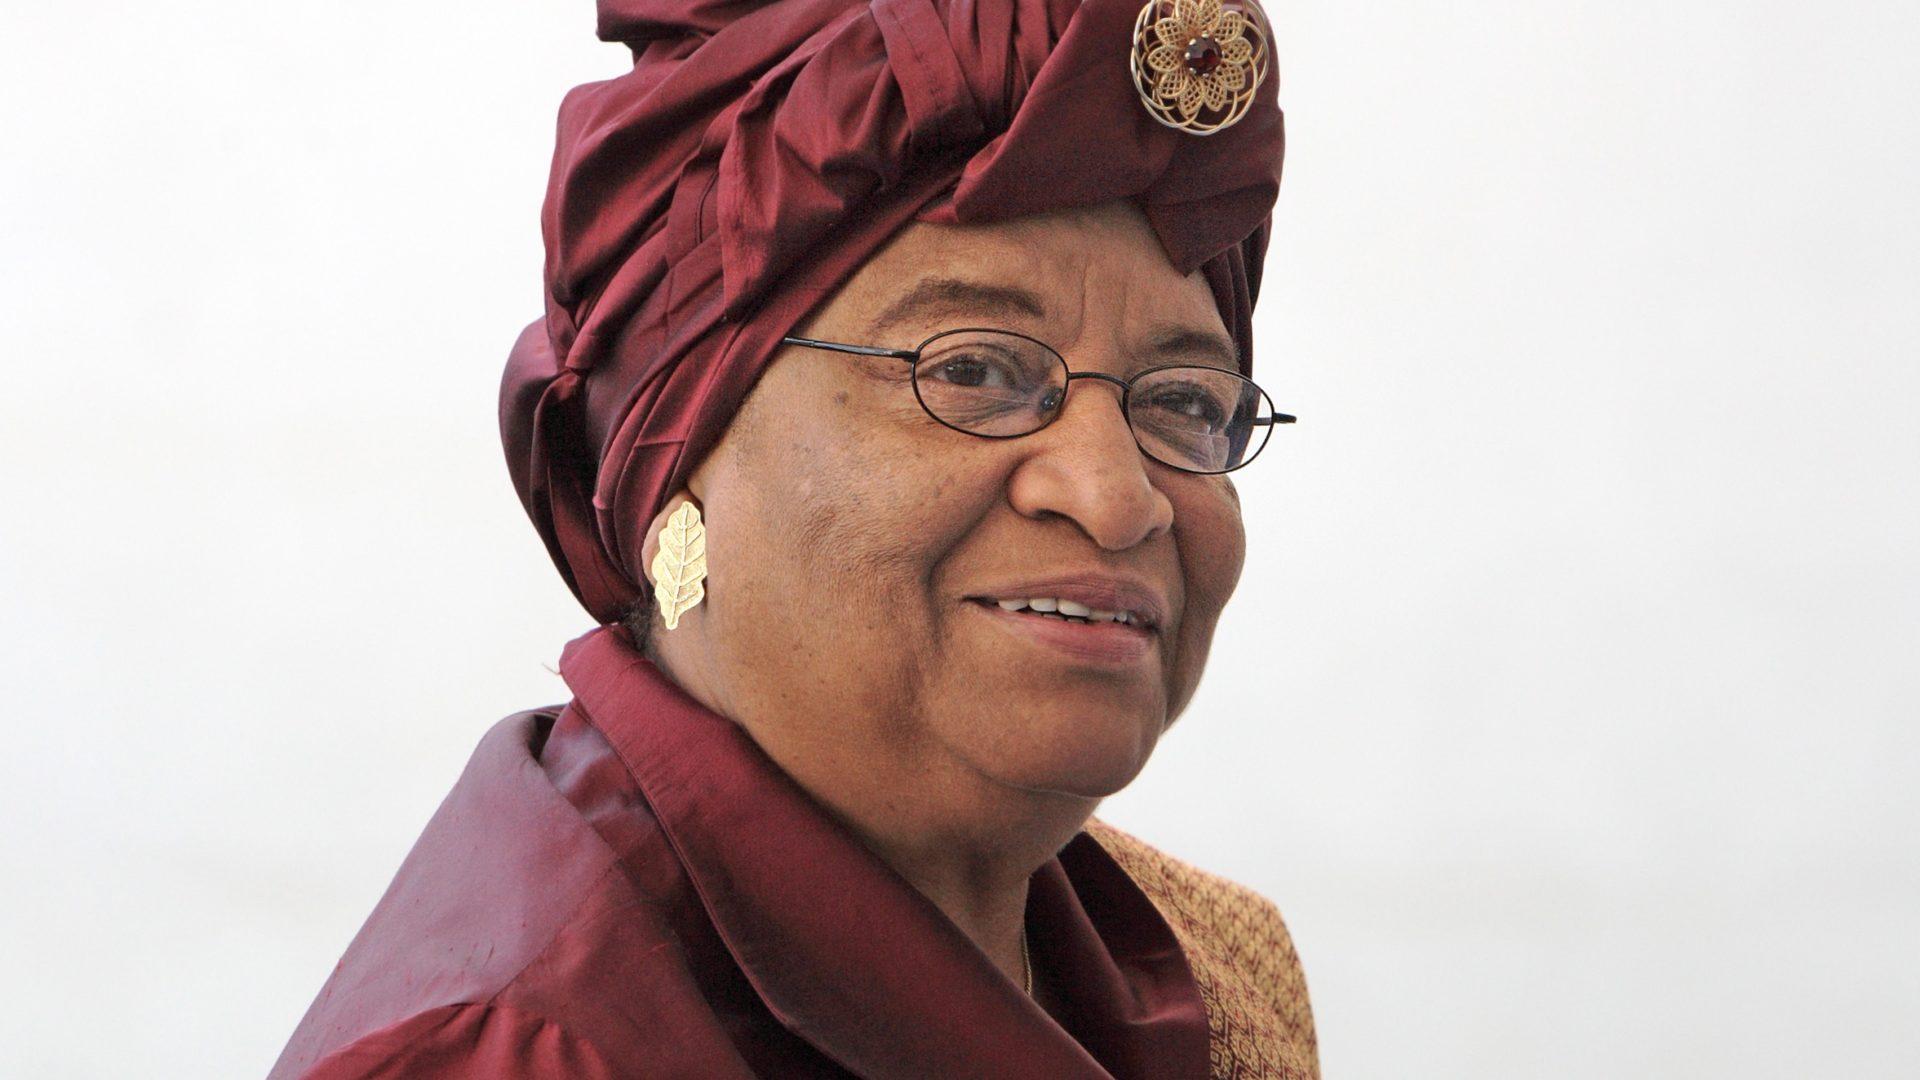 Former President Of Liberia, Ellen Johnson Sirleaf Shares Profound Global Message For Black Business Owners